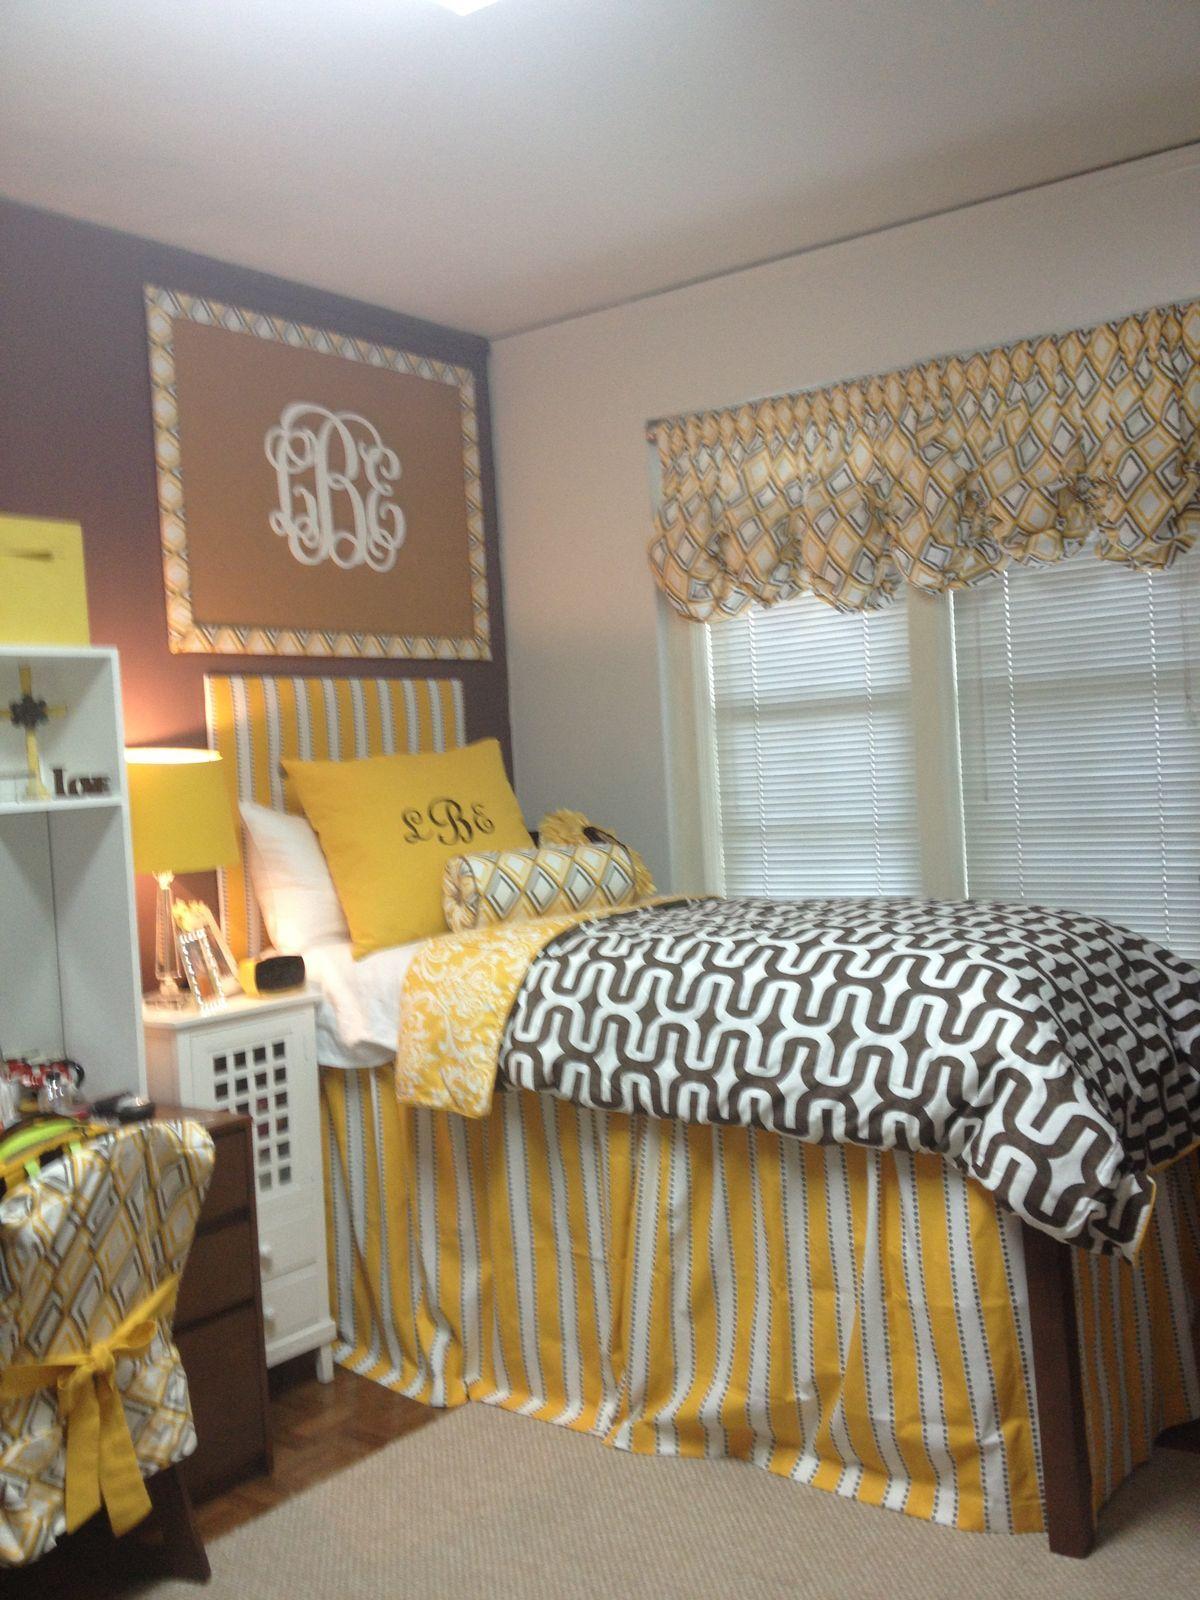 Dorm Room Furniture: Ce479415fb6af3ea408d62185ce321de.jpg 1,200×1,600 Pixels